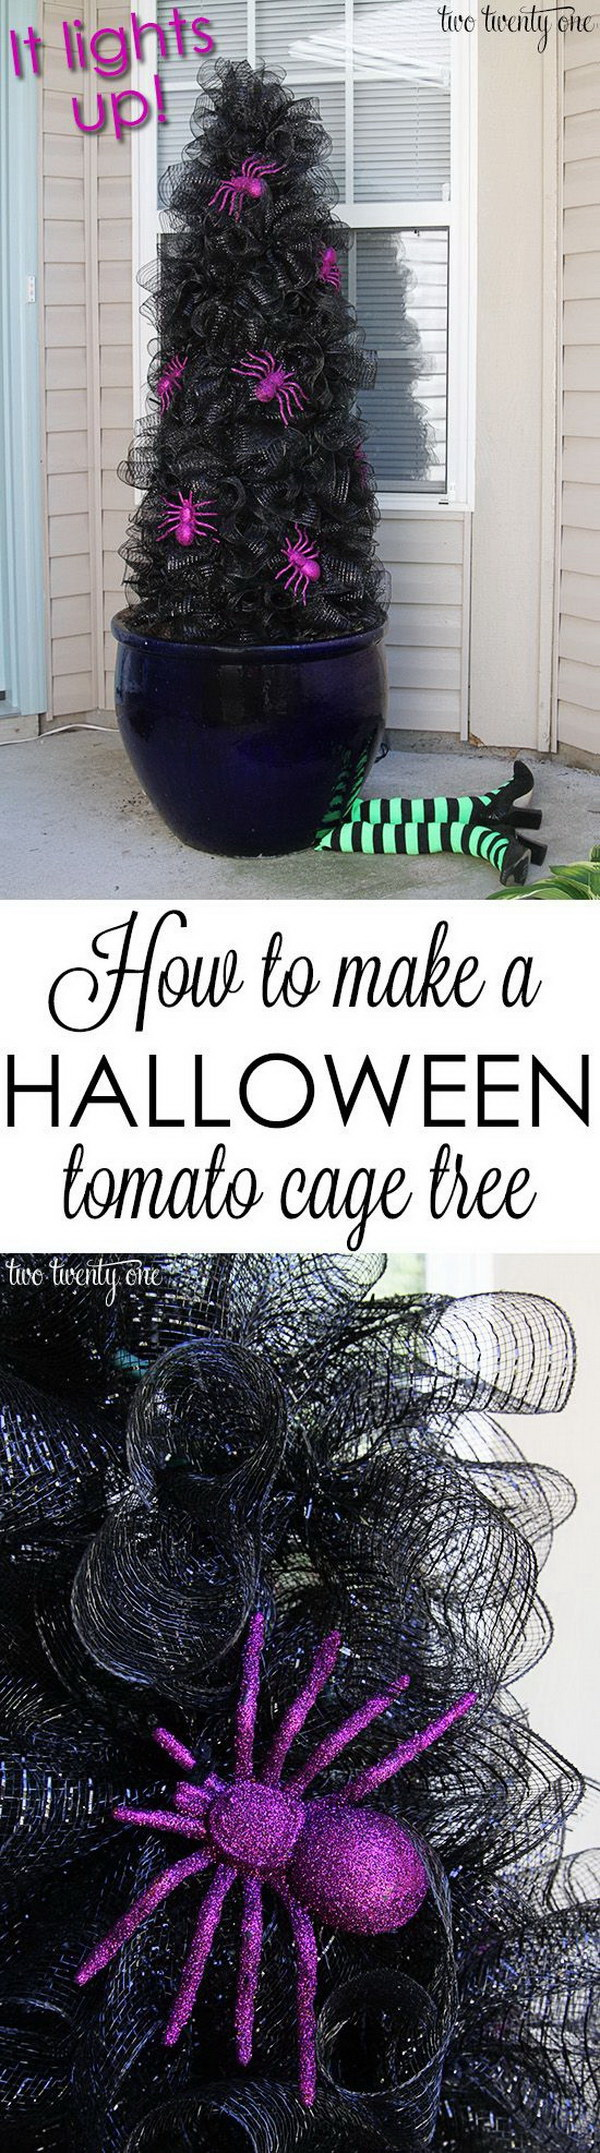 DIY Halloween Tomato Cage Tree For Halloween.